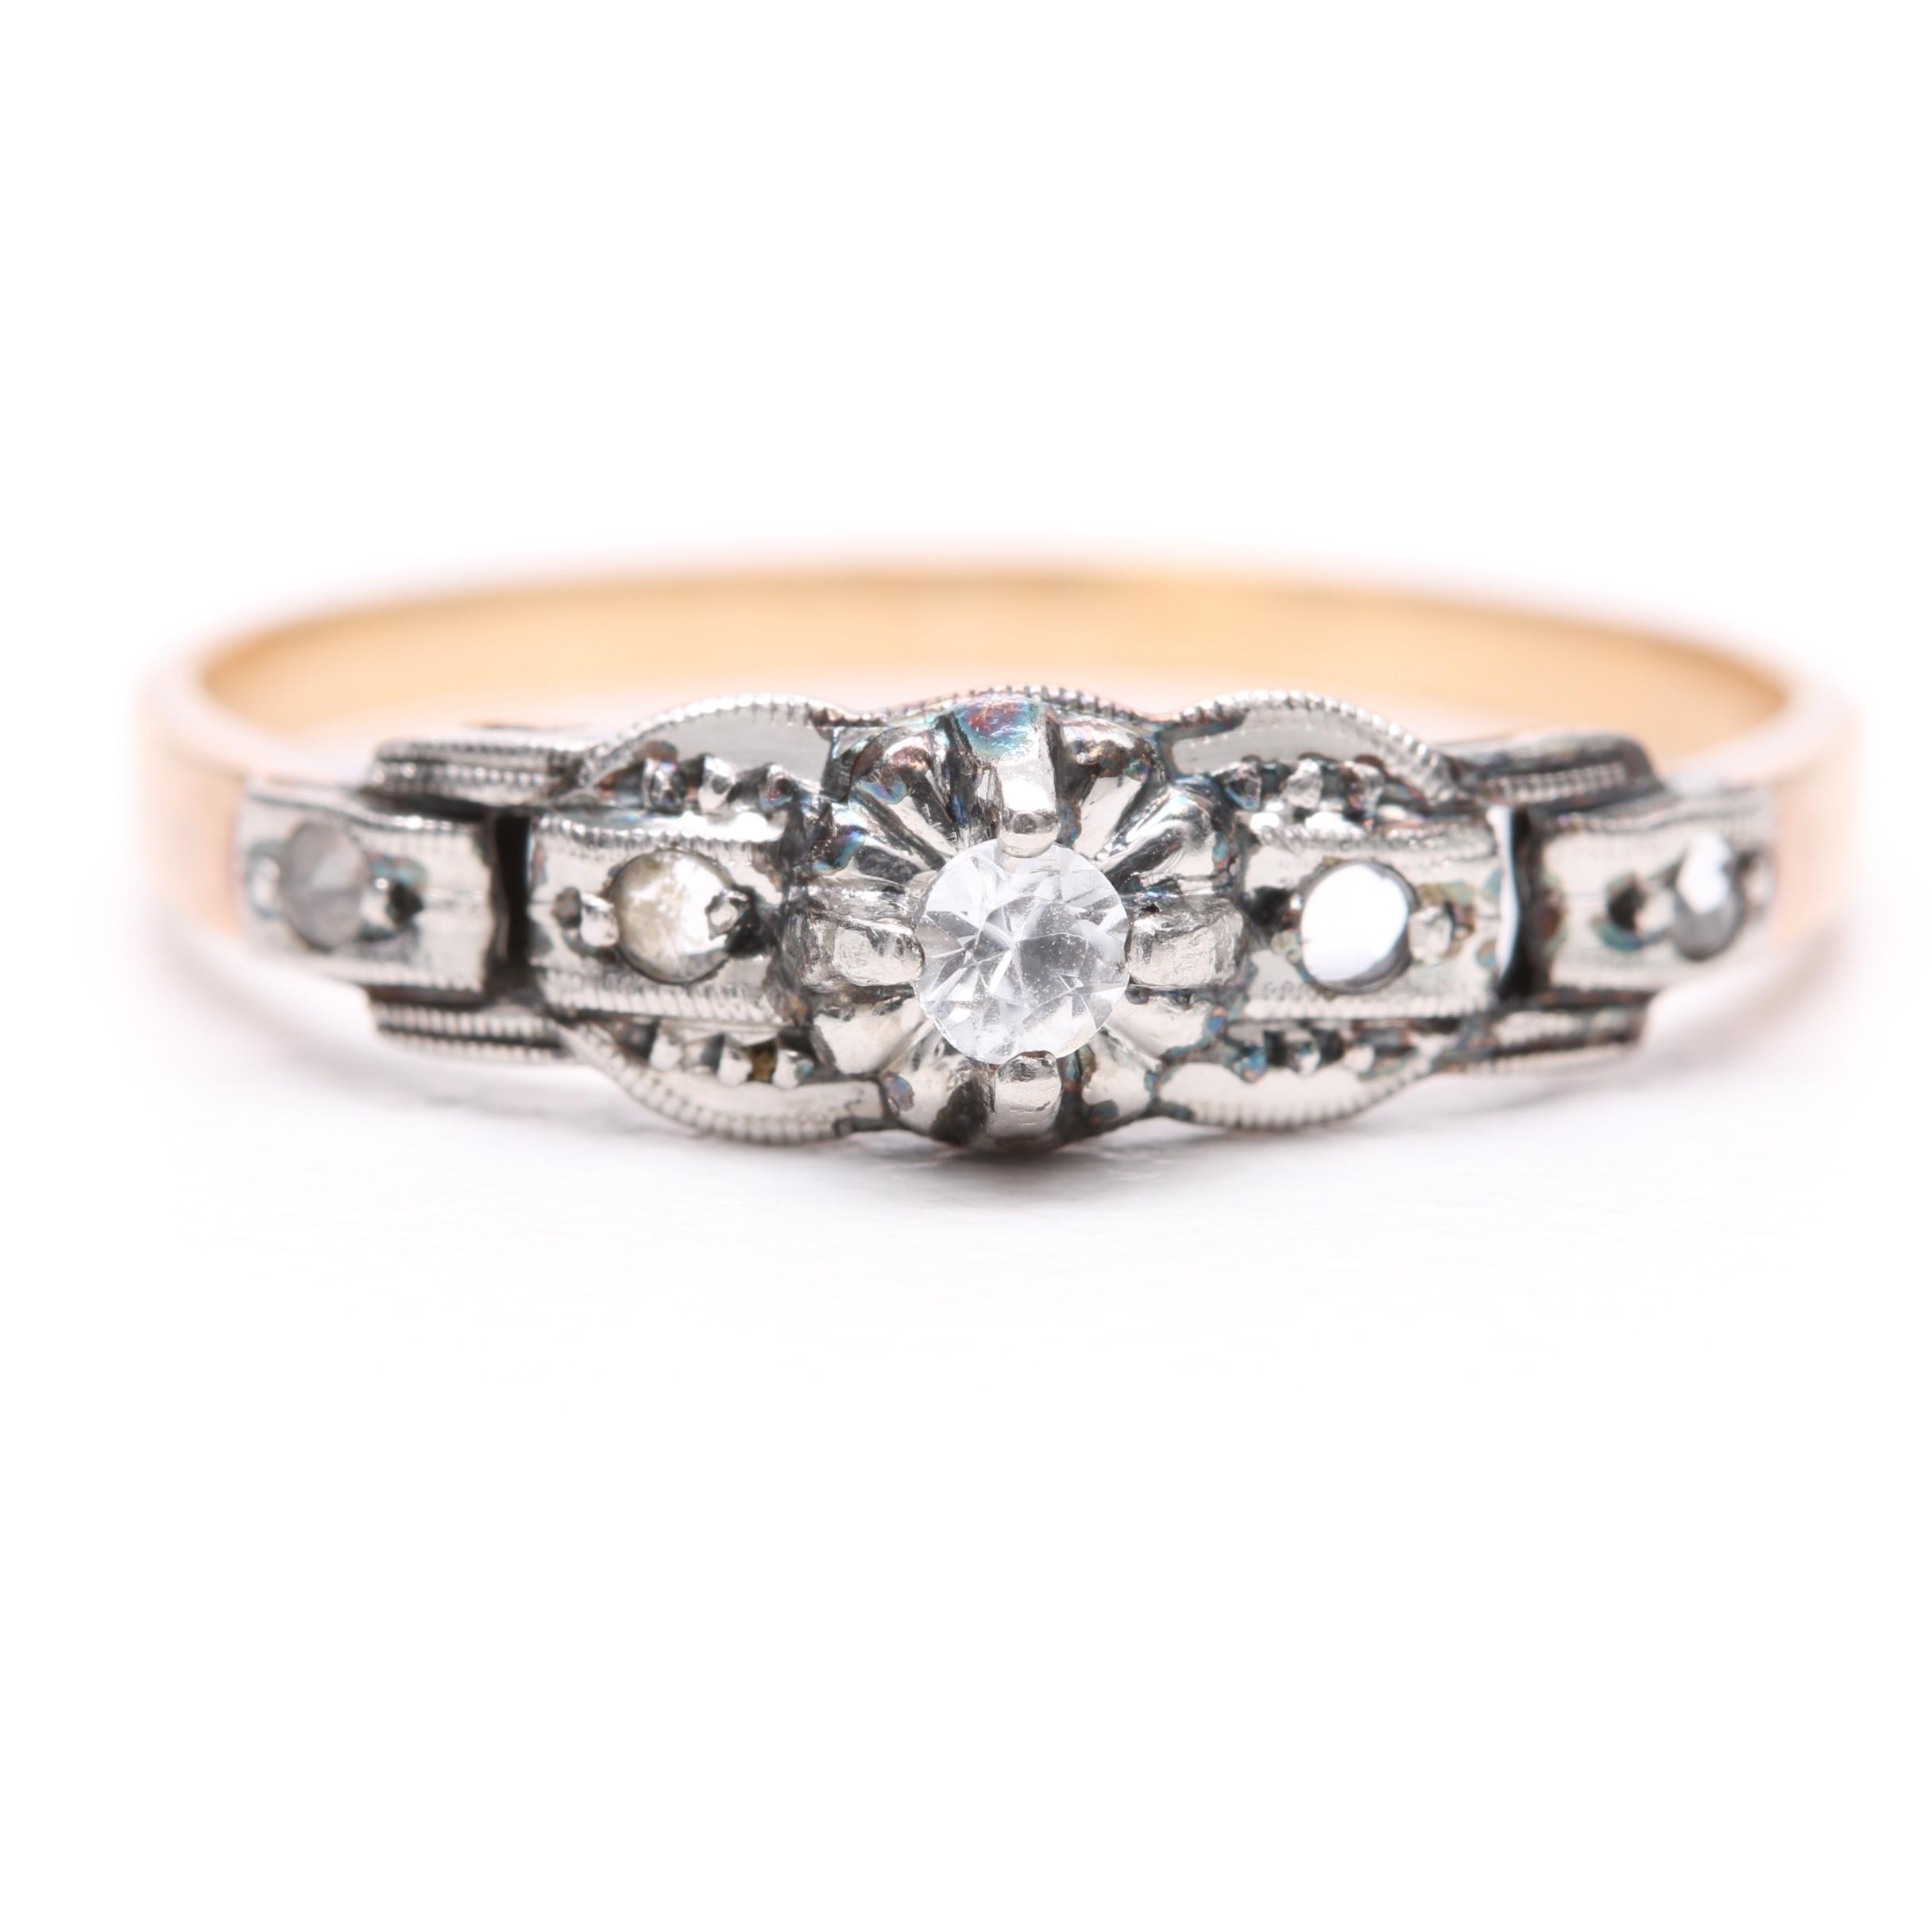 18K Yellow Gold and Platinum White Sapphire Ring